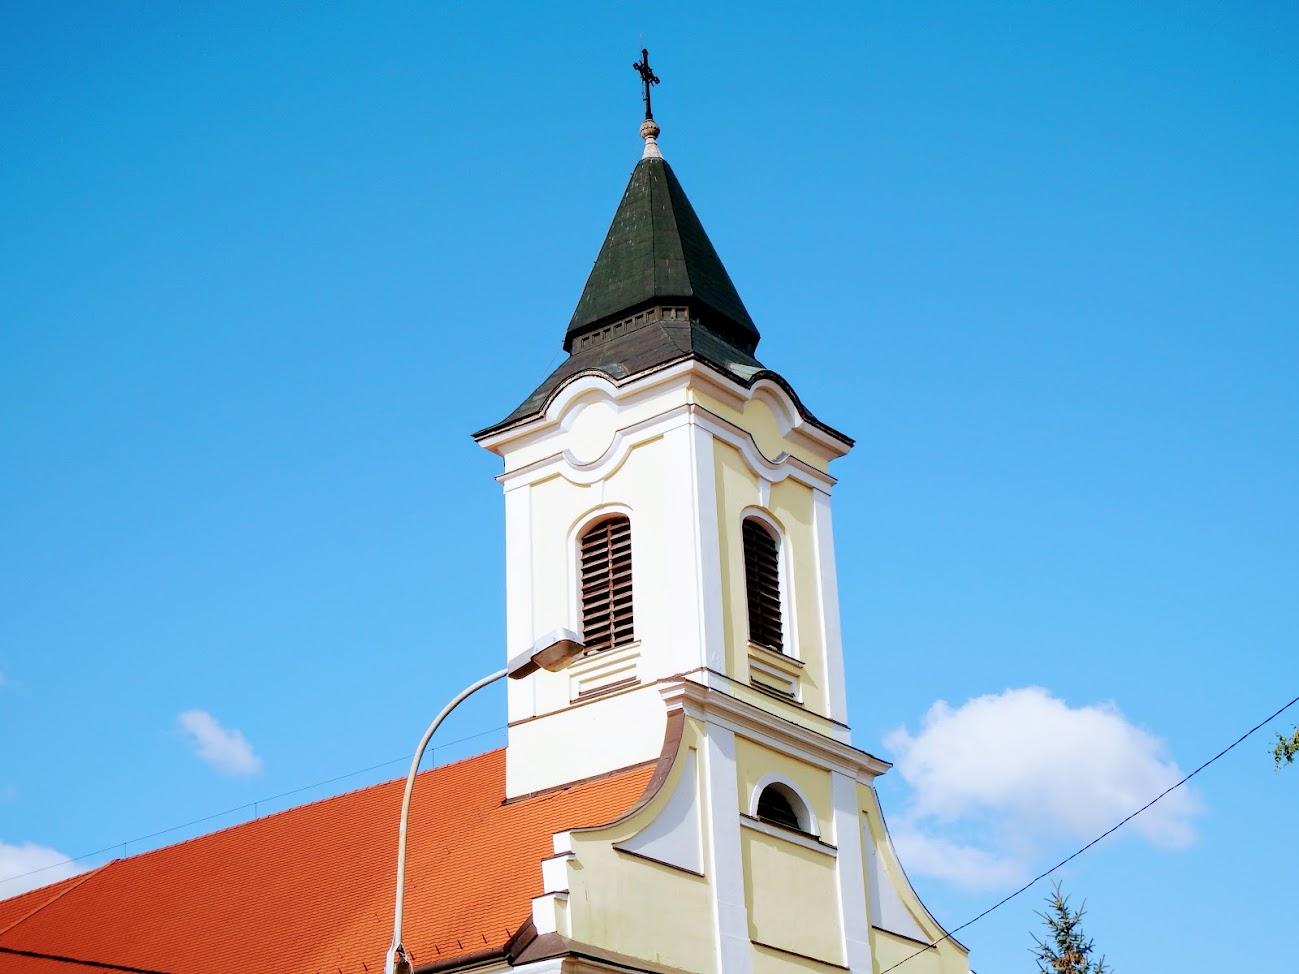 Tatabánya - Alsógallai Szent Gál rk. templom